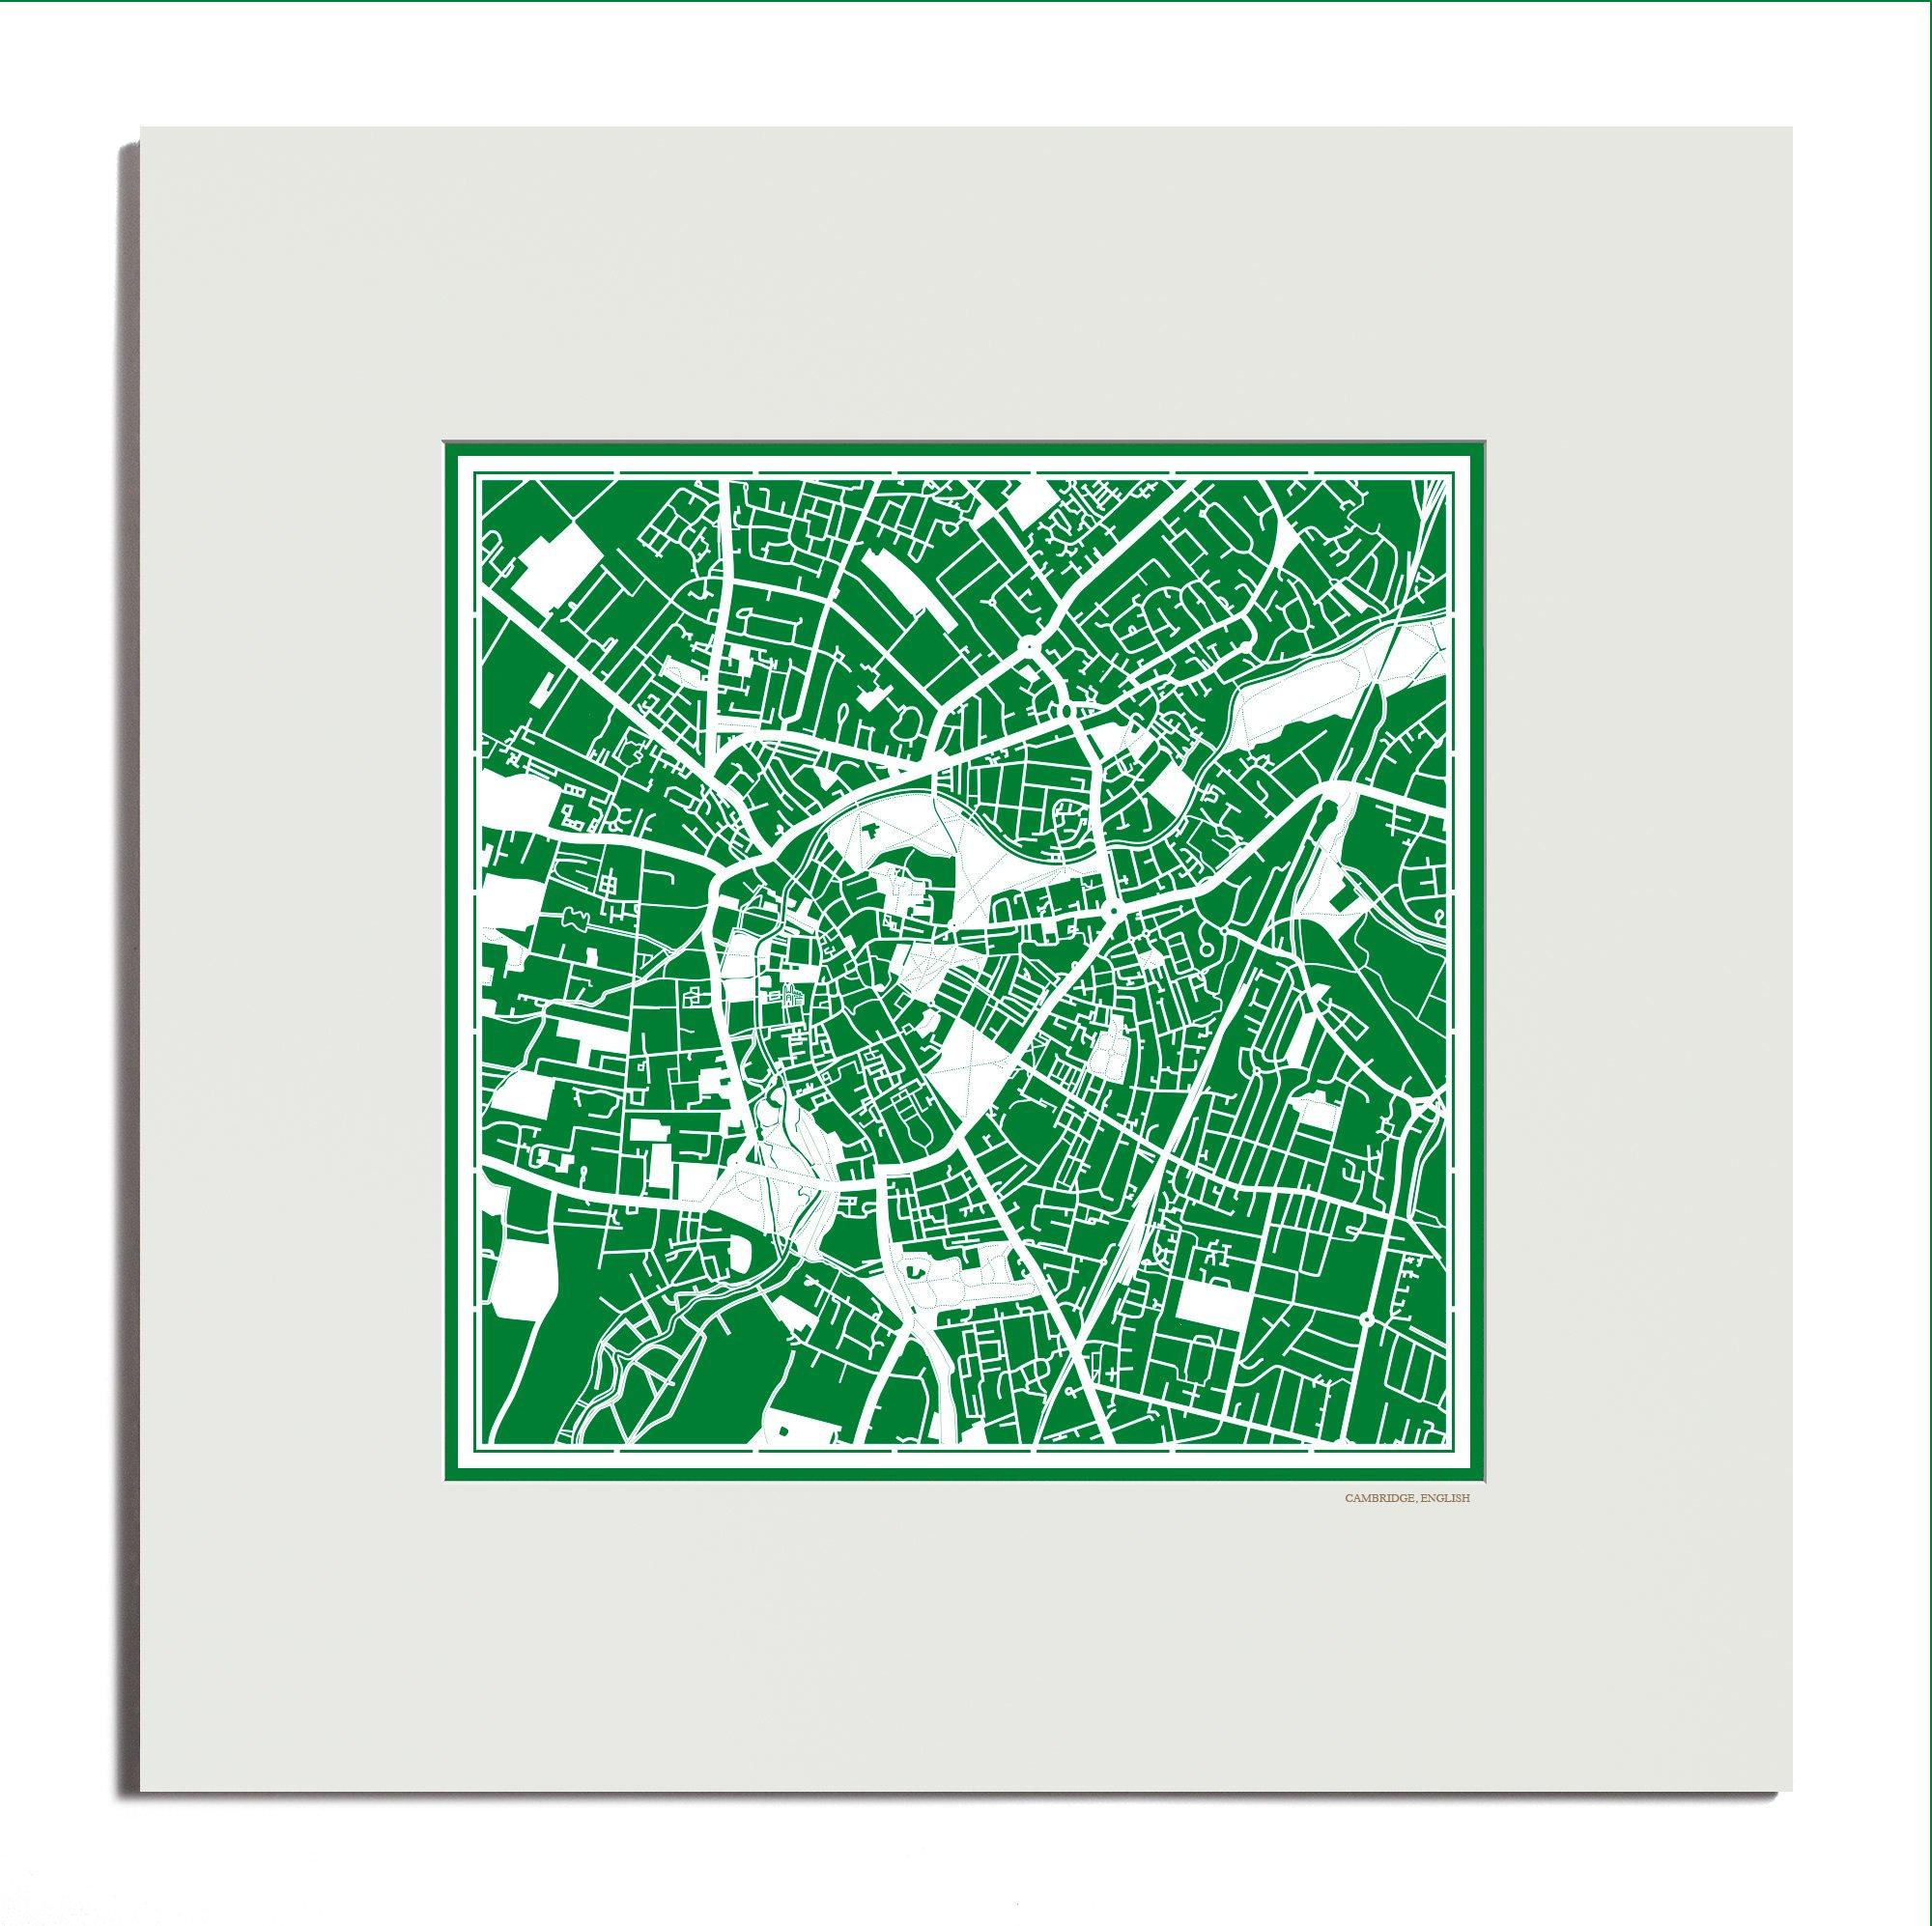 O3 Design Studio Cambridge, England Paper Cut Map Matted Green 20x20 In. Paper Art